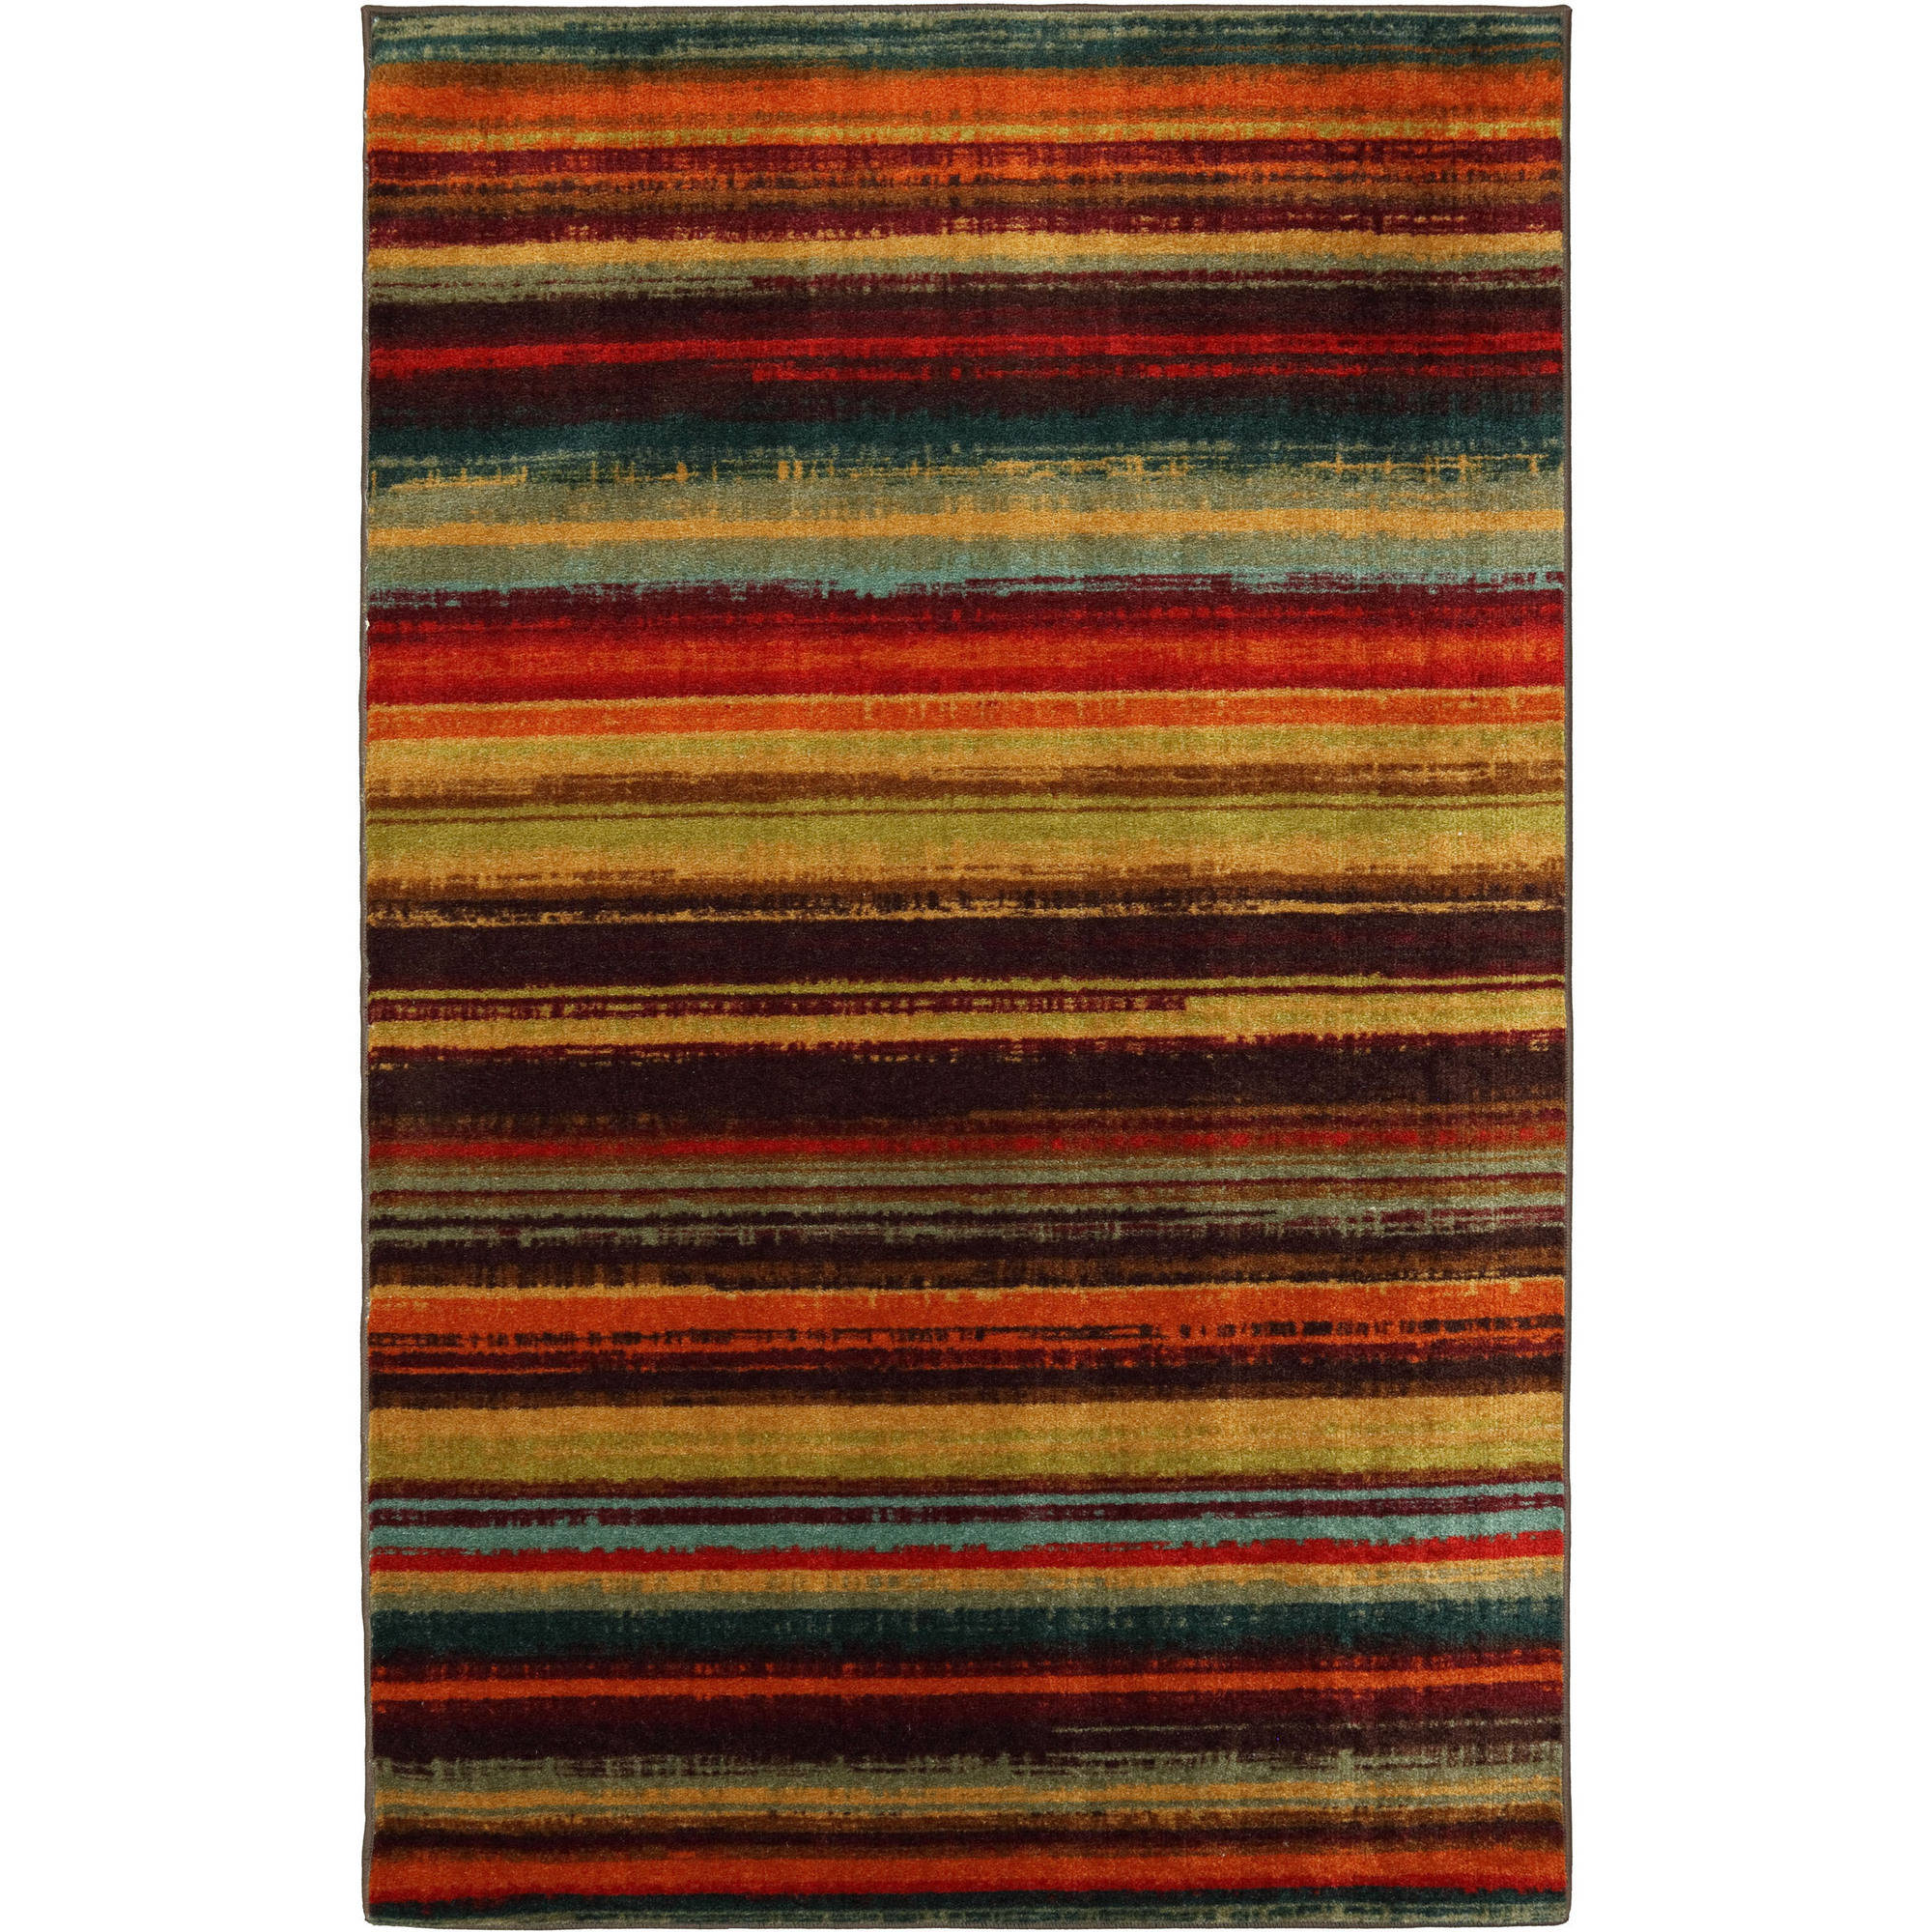 Mohawk Home Boho Stripe Printed Nylon Area Rug